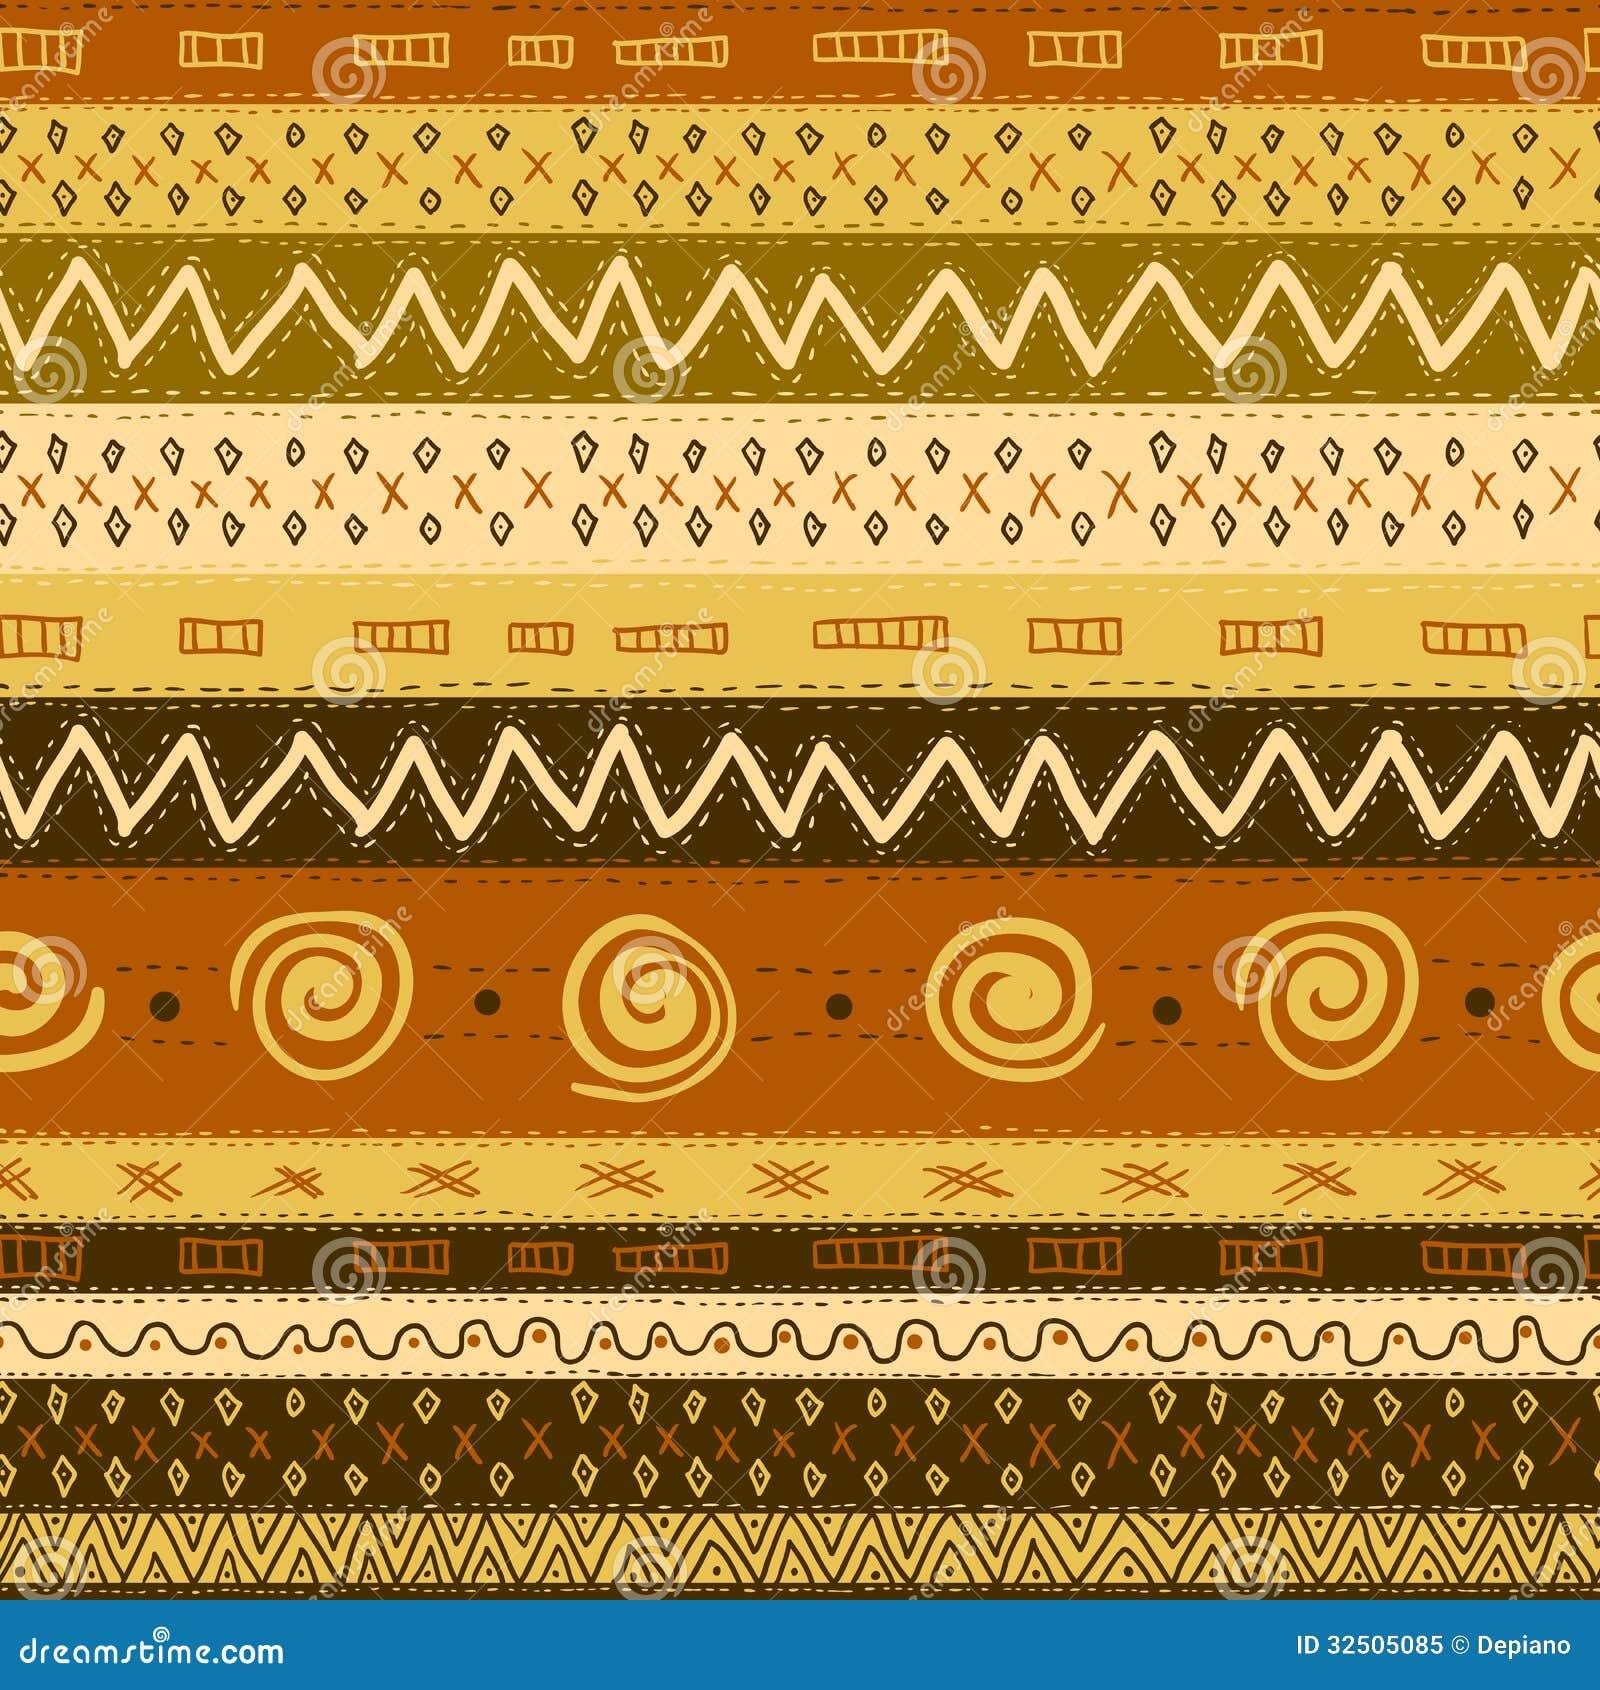 vintage style wallpaper borders